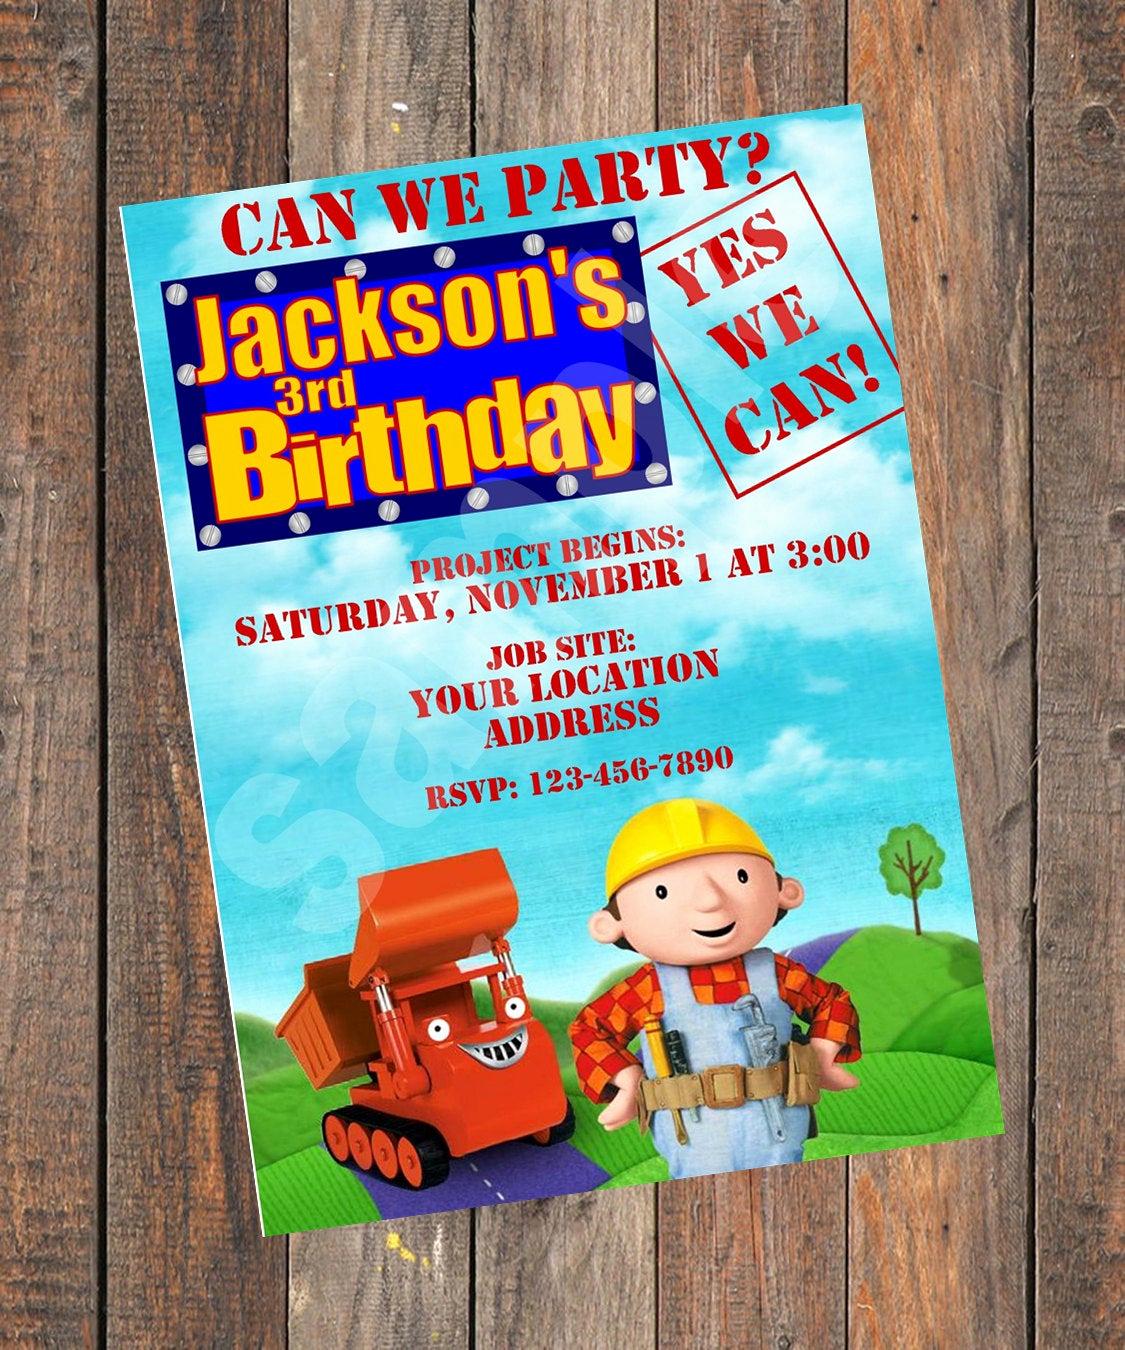 Bob the Builder Invitation Luxury Bob the Builder Birthday Invitation original by